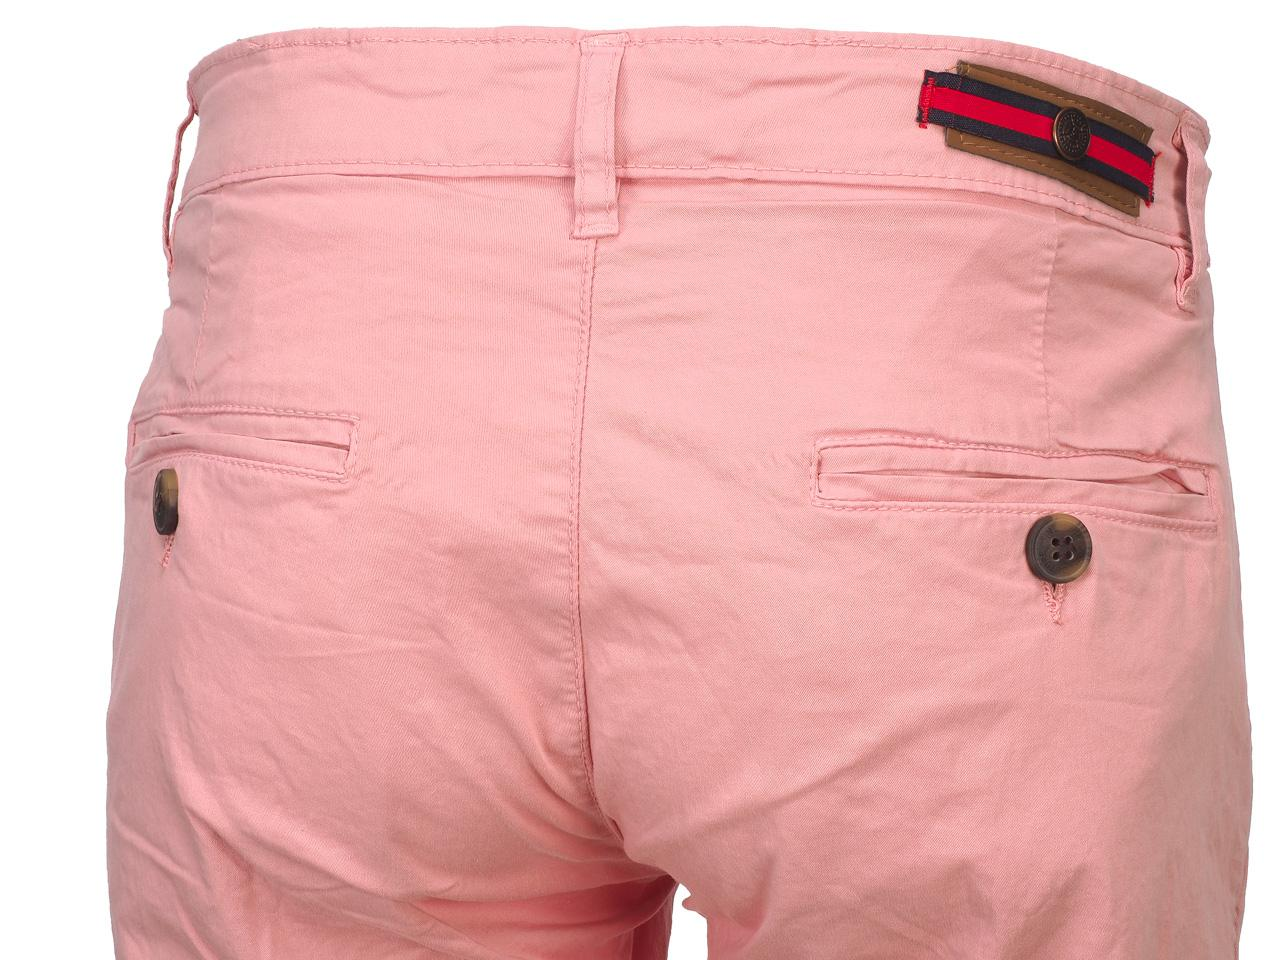 Bermuda-Shorts-Hite-Couture-Vobier-Rse-Bermuda-Chino-Pink-11606-New thumbnail 4